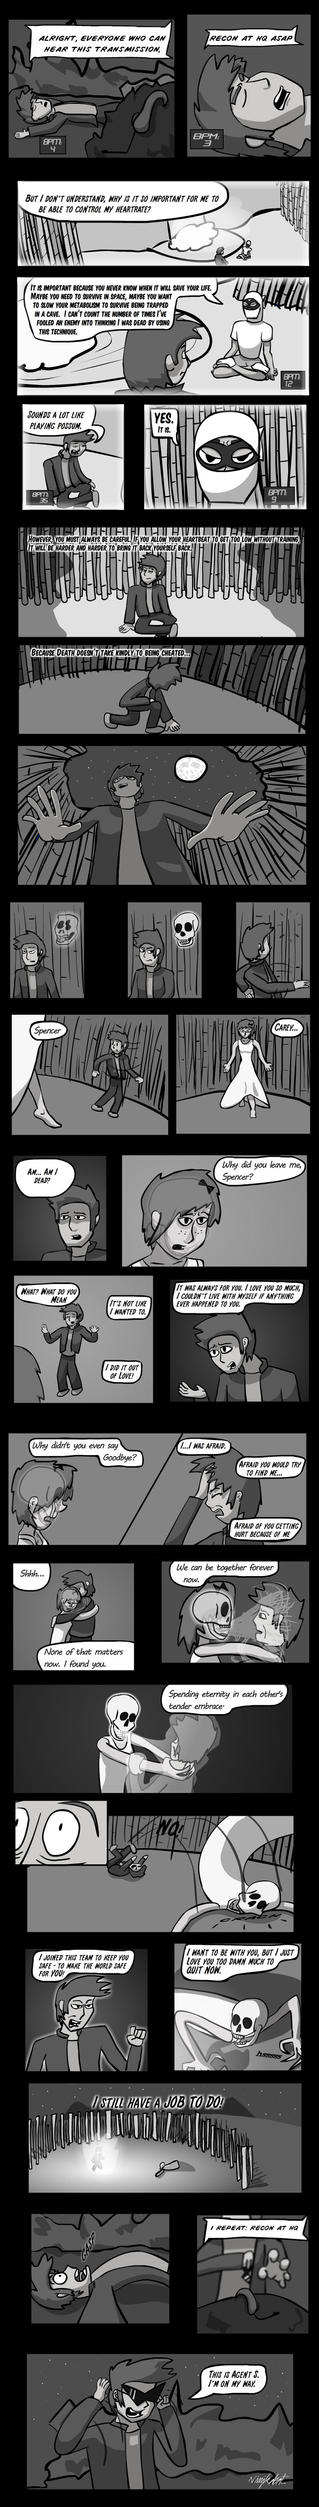 SB: Comic Jam pg 2 by ninjkabat